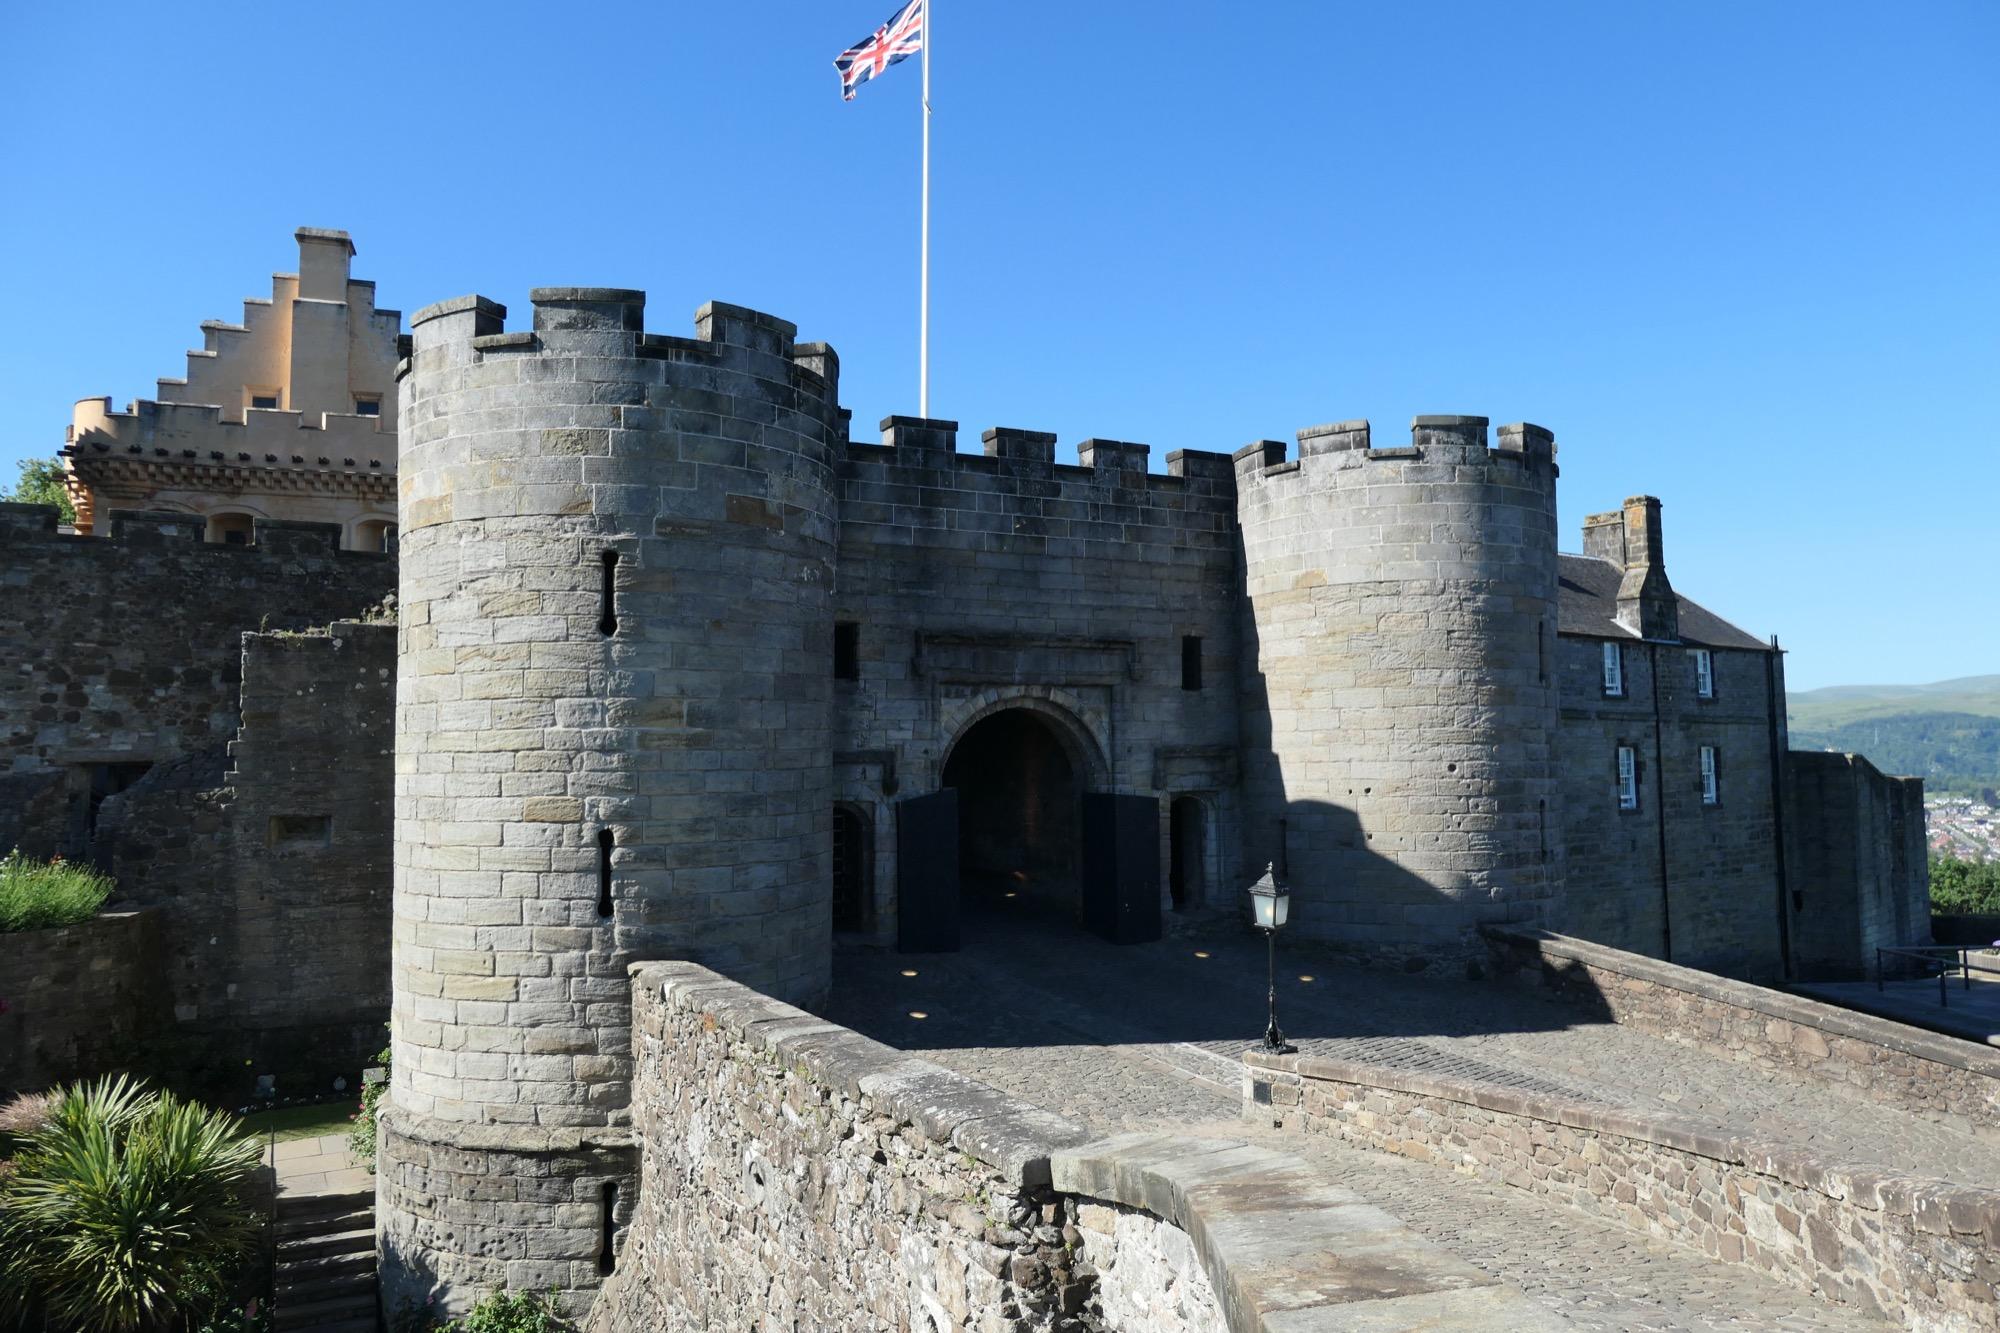 Main entrance to stirling castle.